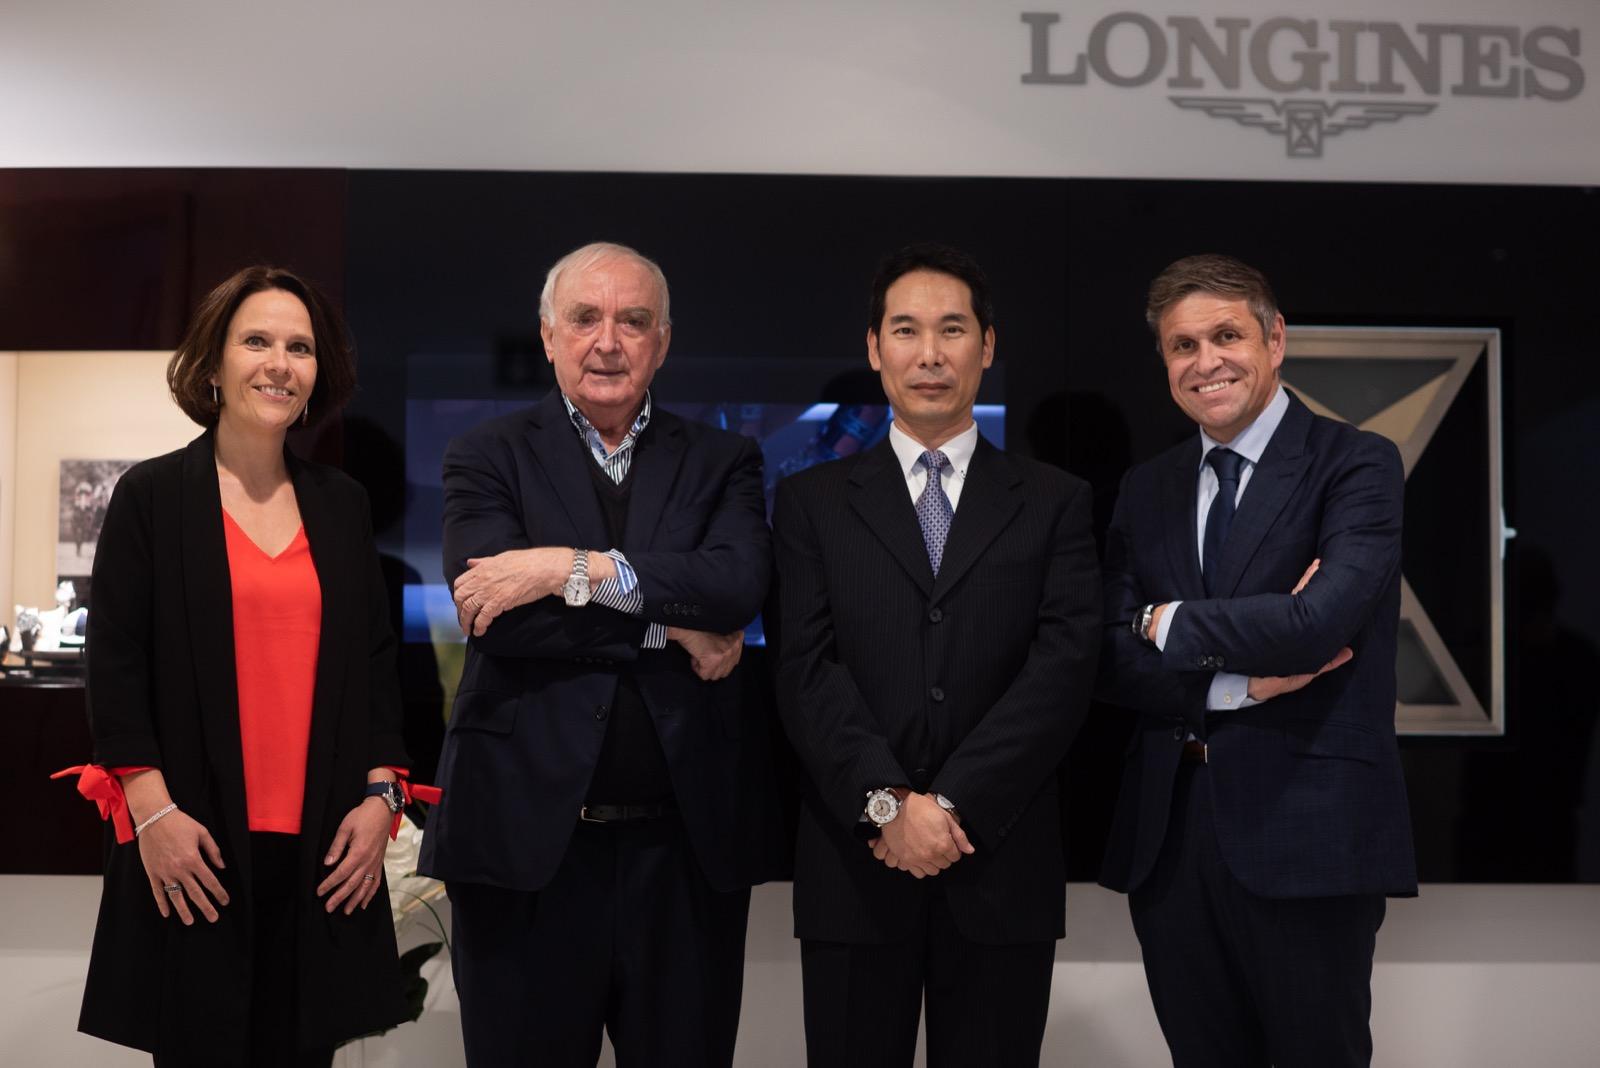 Longines Watch 183